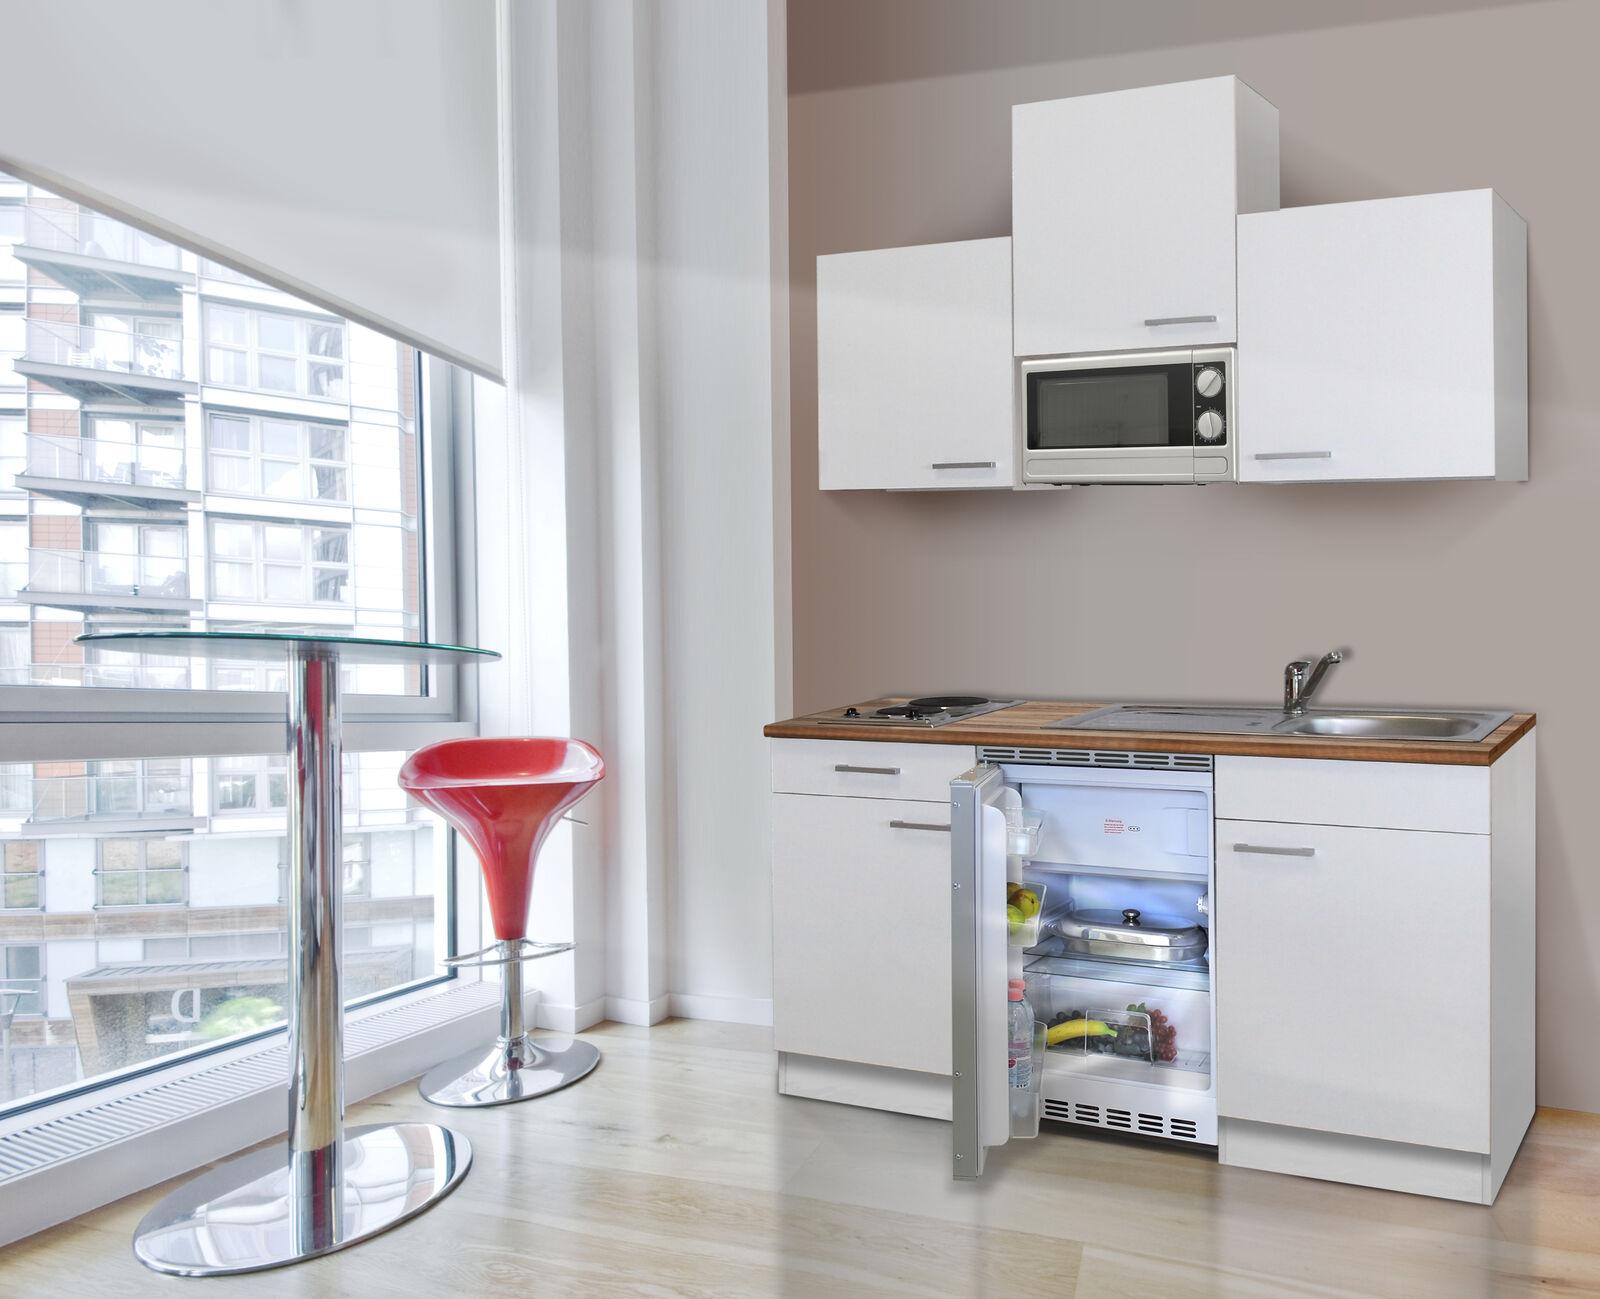 Full Size of Mini Küche Einrichten Mini Küche Landhaus Mini Küche Japan Ikea Mini Küche Küche Mini Küche